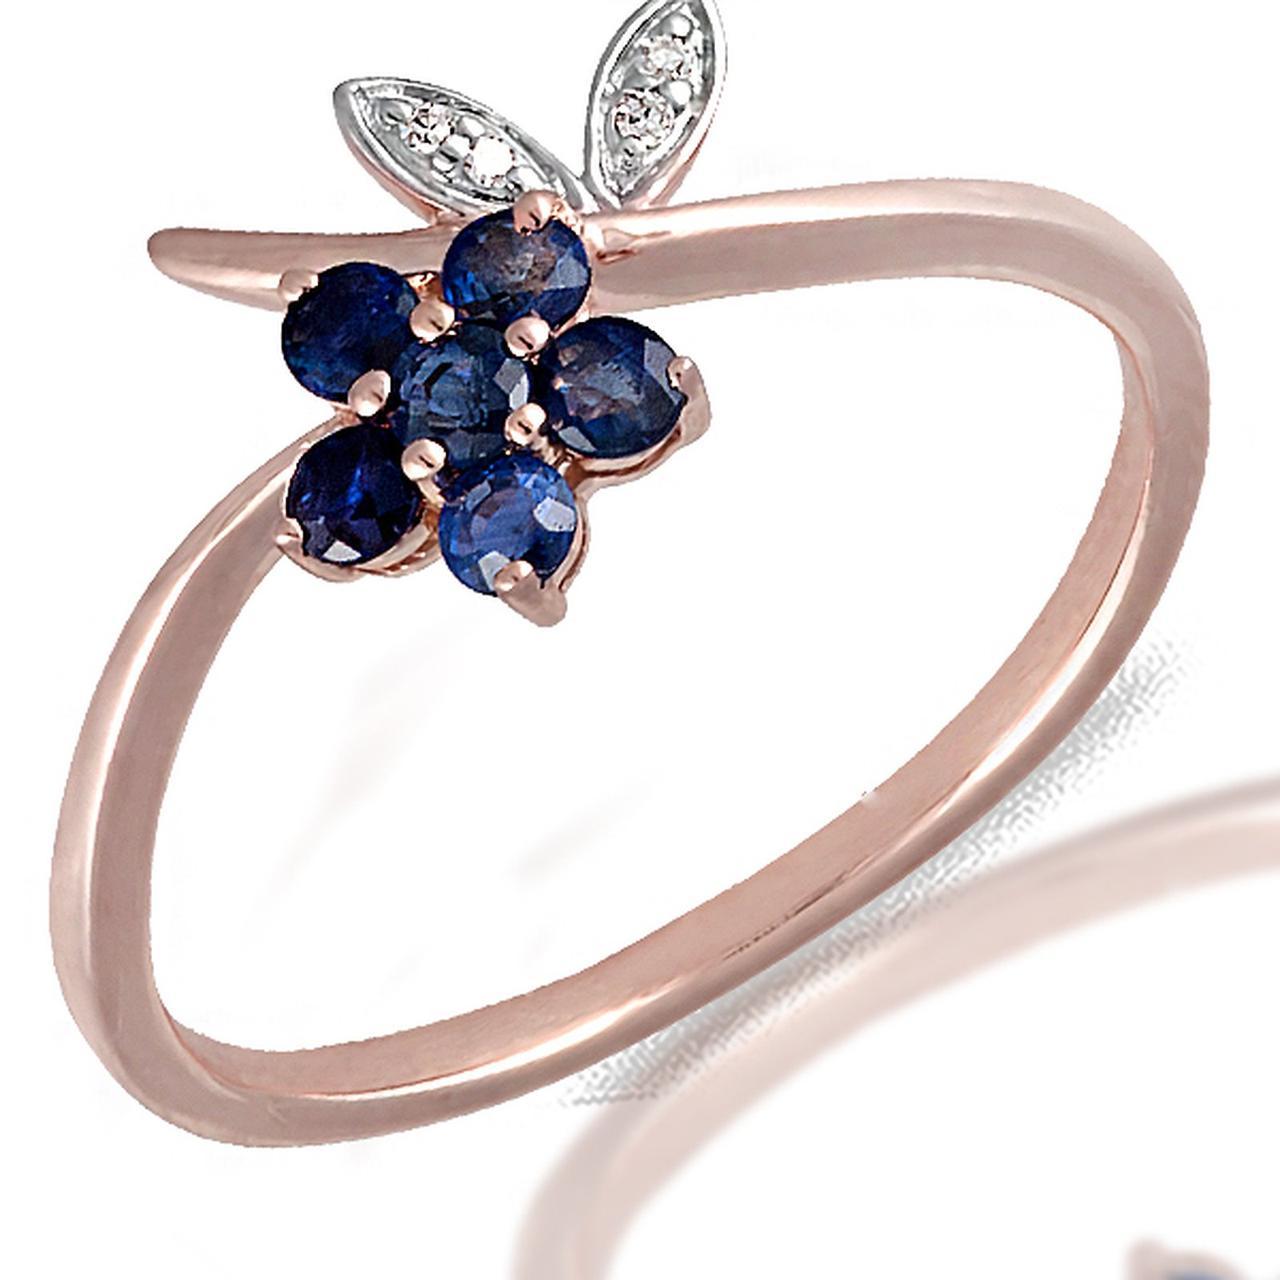 Золотое кольцо с бриллиантами и сапфирами, размер 16 (056623)